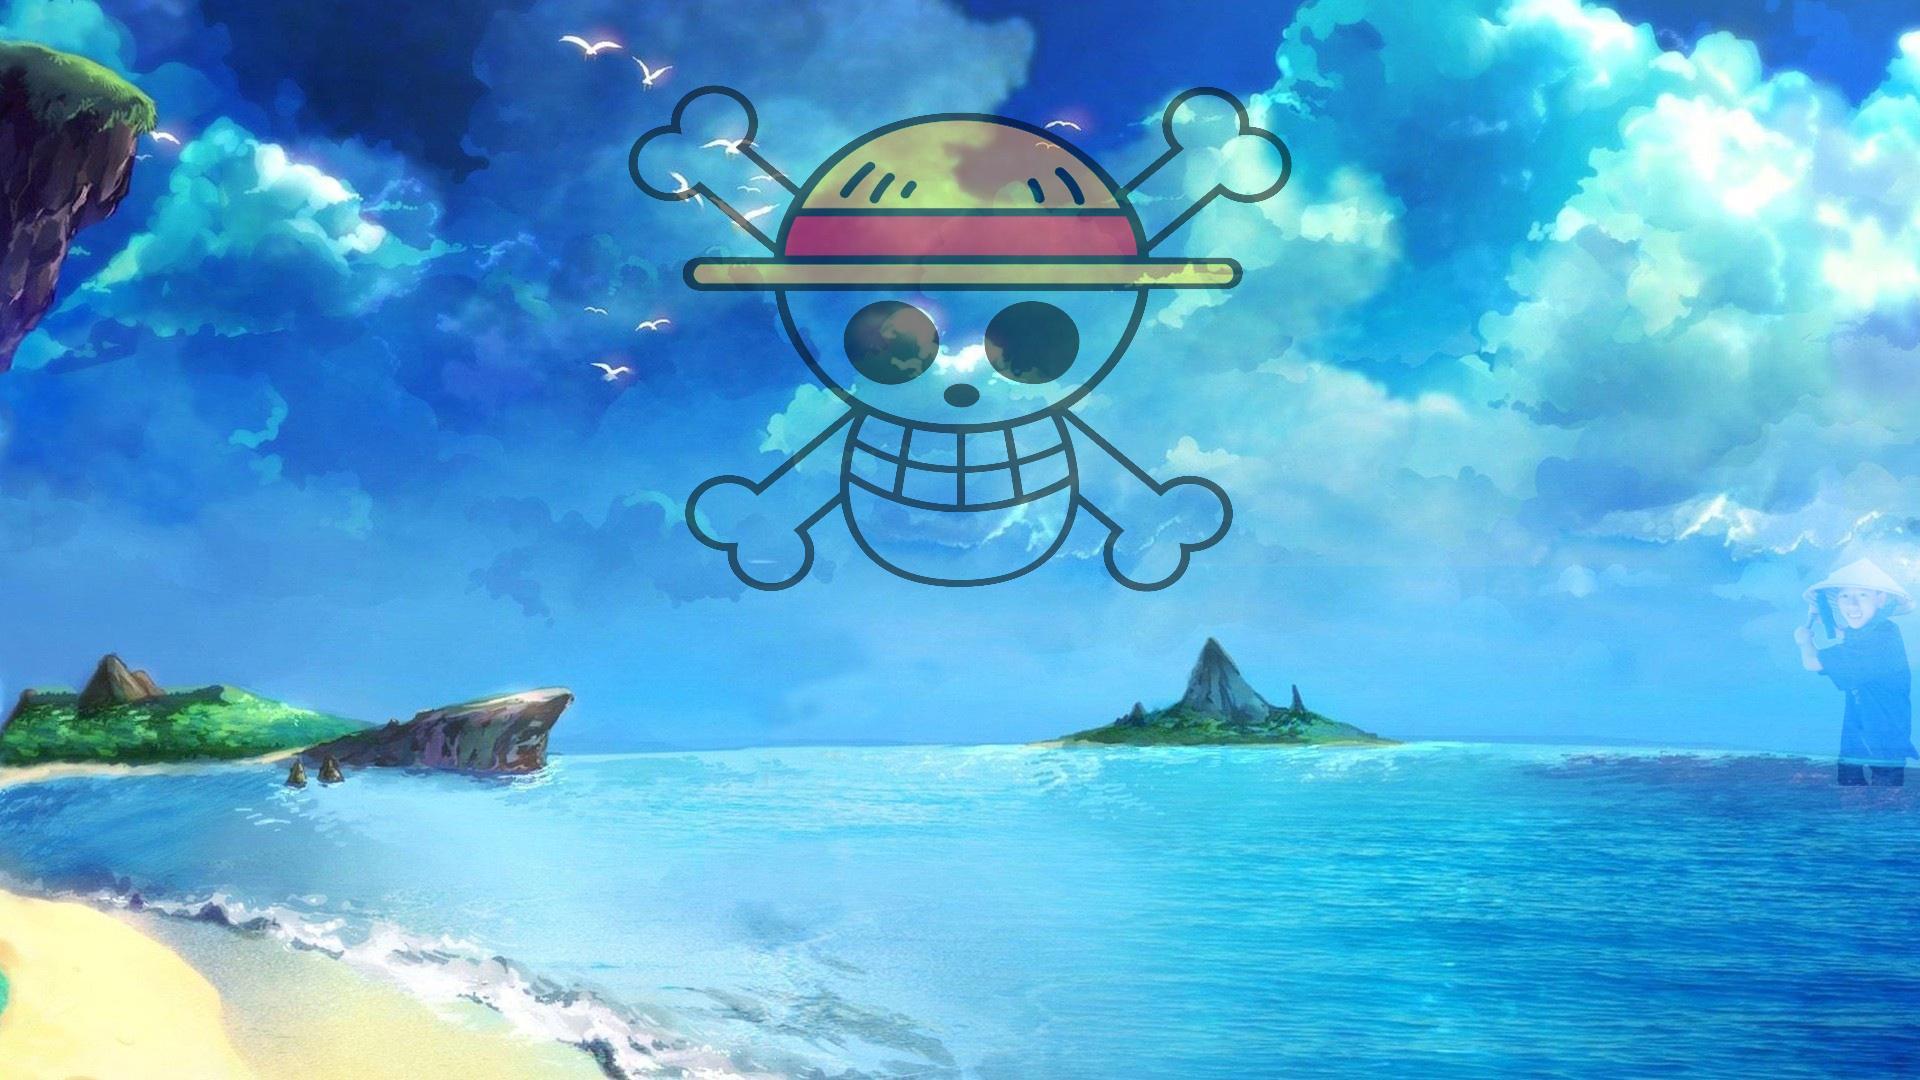 One Piece Wallpaper - Chrono Trigger - HD Wallpaper